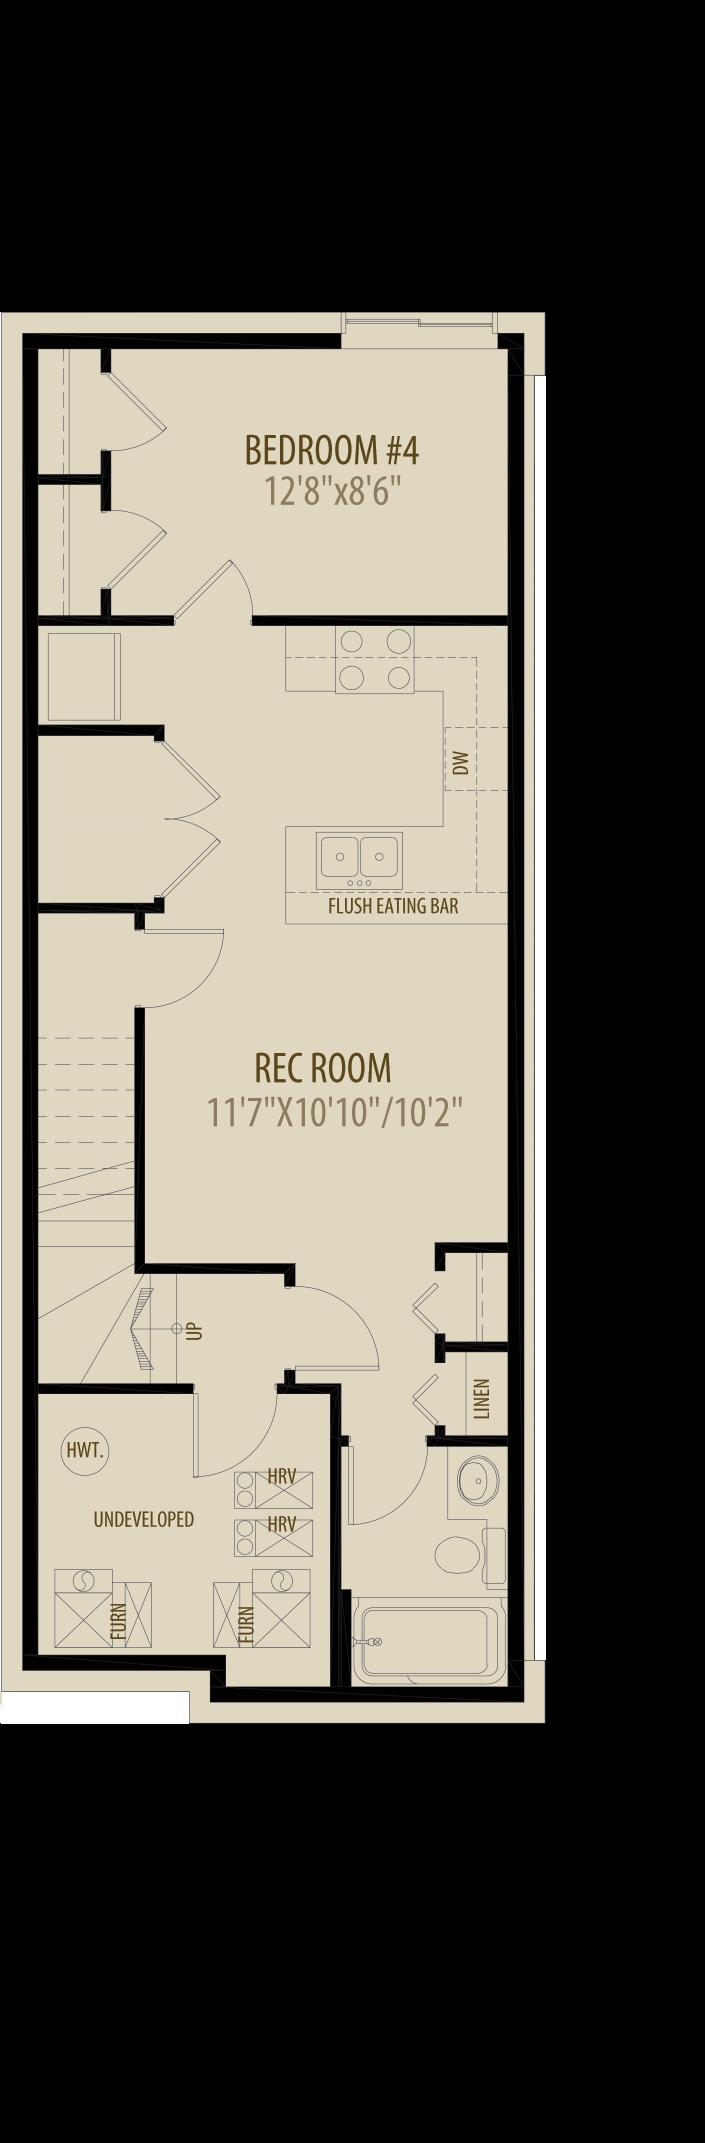 Beckett Floorplan